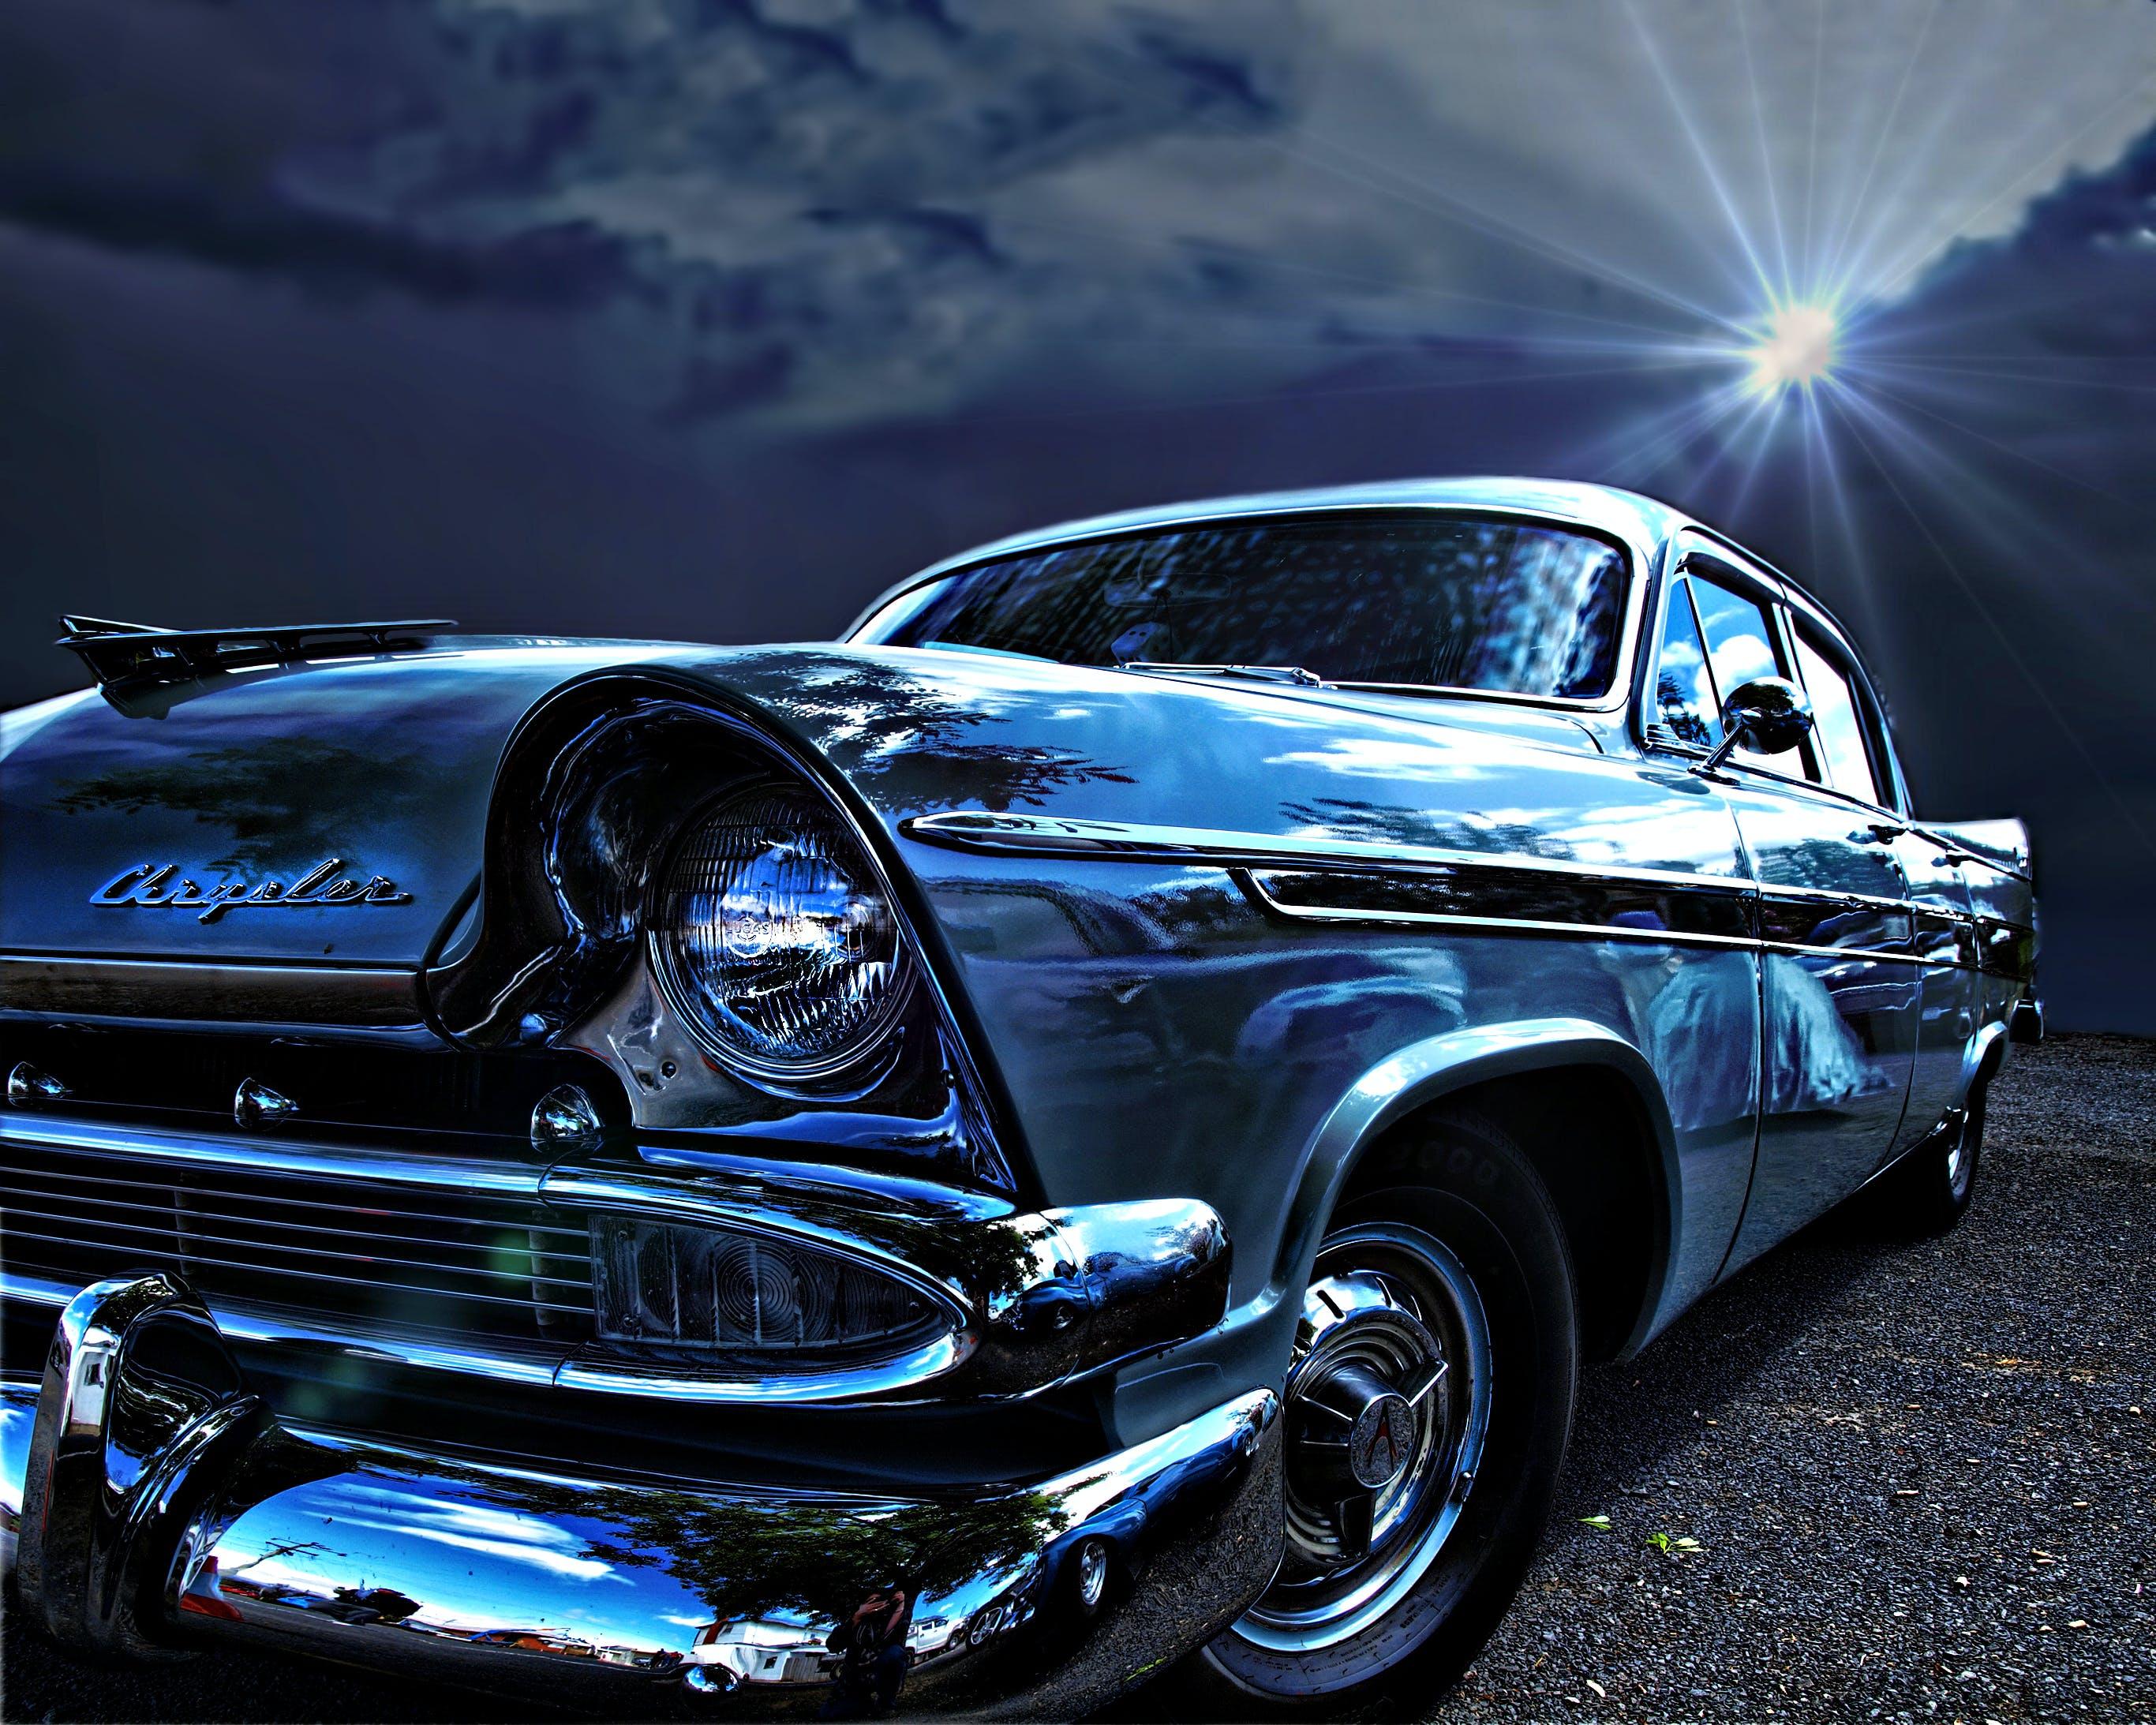 Free stock photo of blue, car, chrysler, vintage